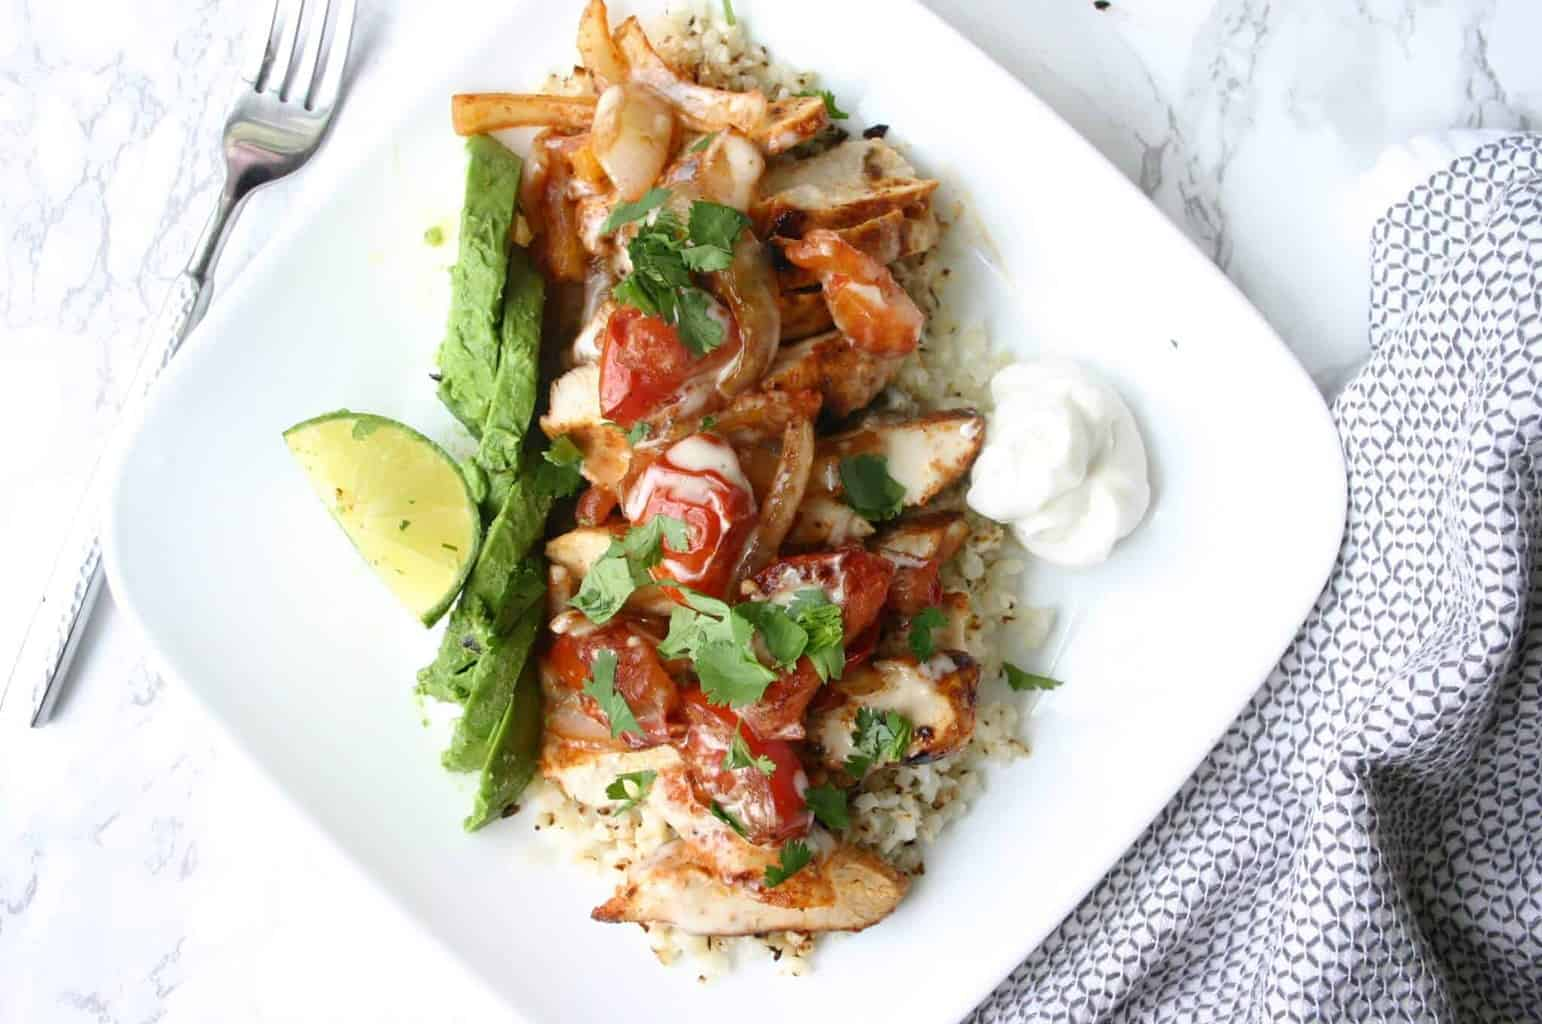 One of the best cauliflower rice recipes - Arroz con pollo with cauliflower rice!